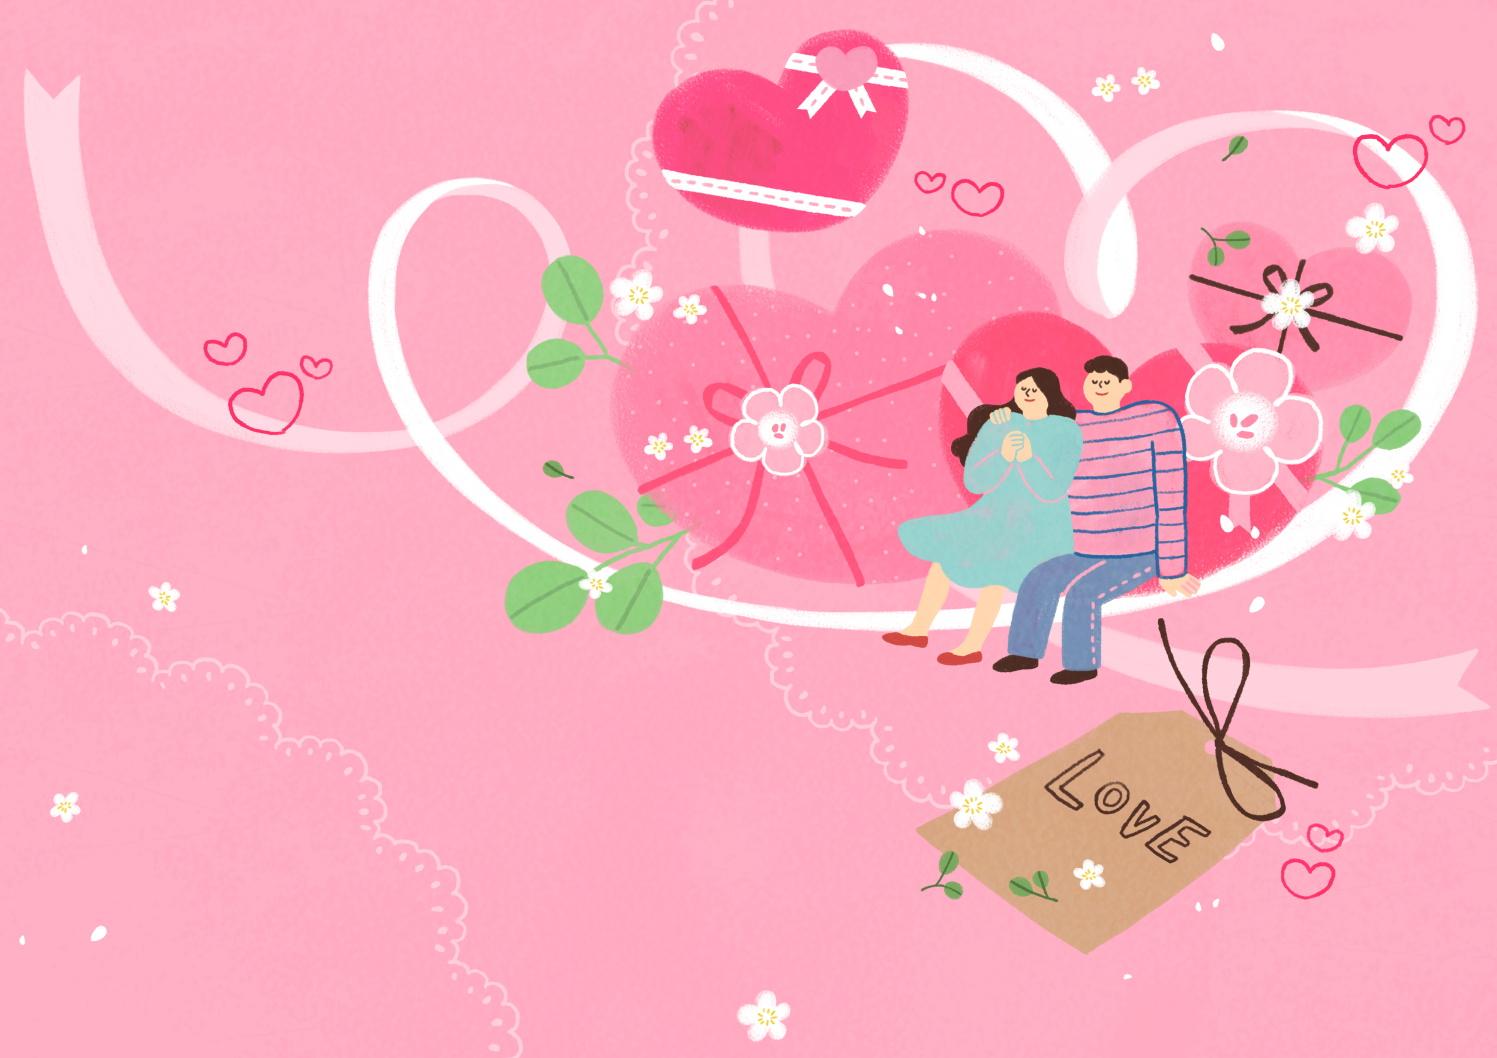 12款情人节七夕情侣手绘插画海报传单设计PSD素材 Valentines Day Couple Hand Drawn Illustration插图8